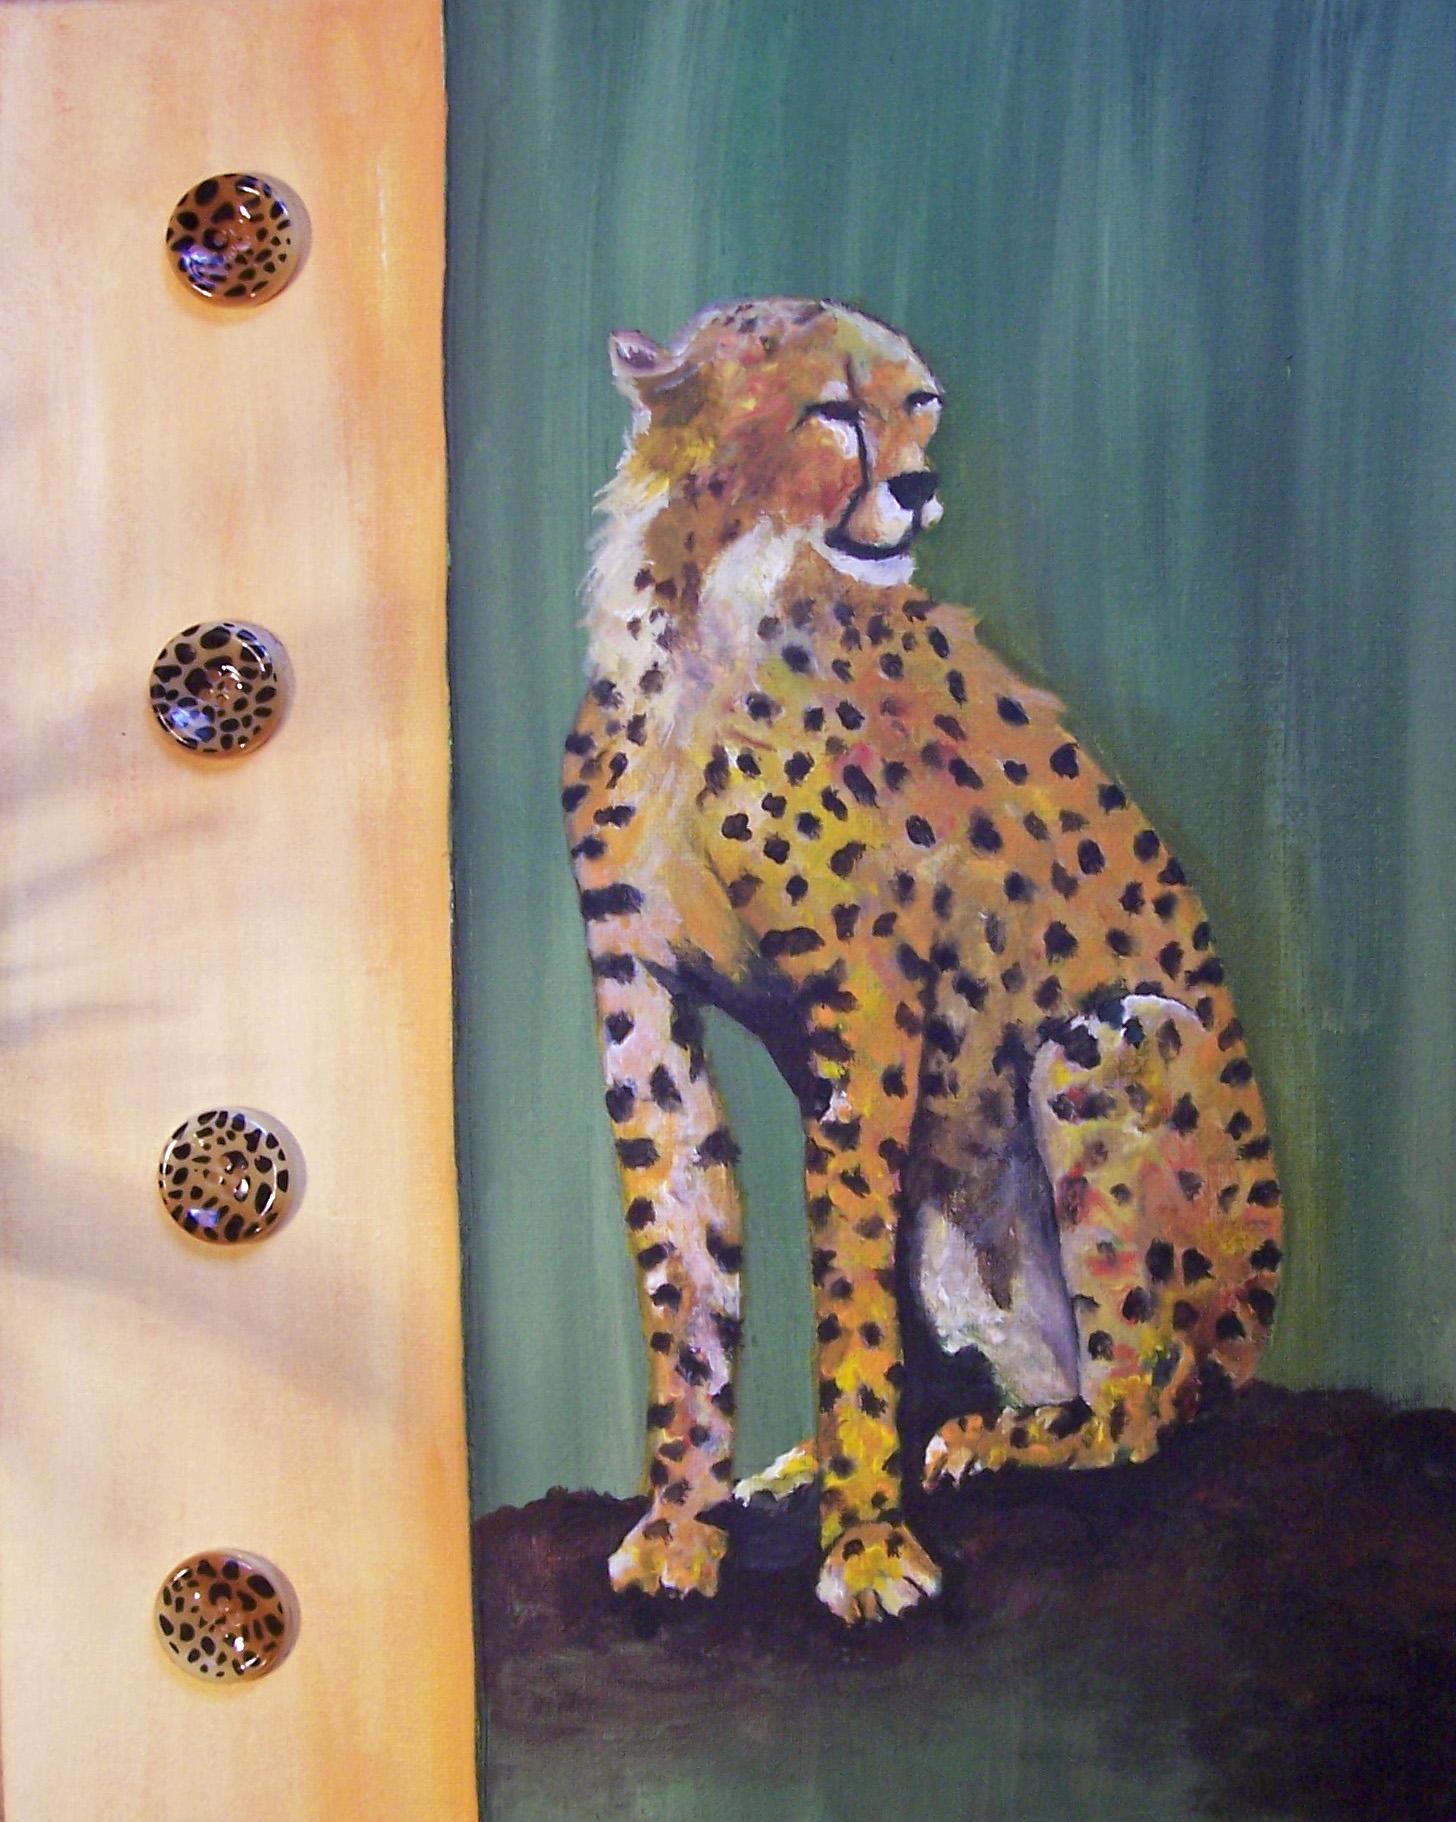 DESCRIPTION: Cheetah